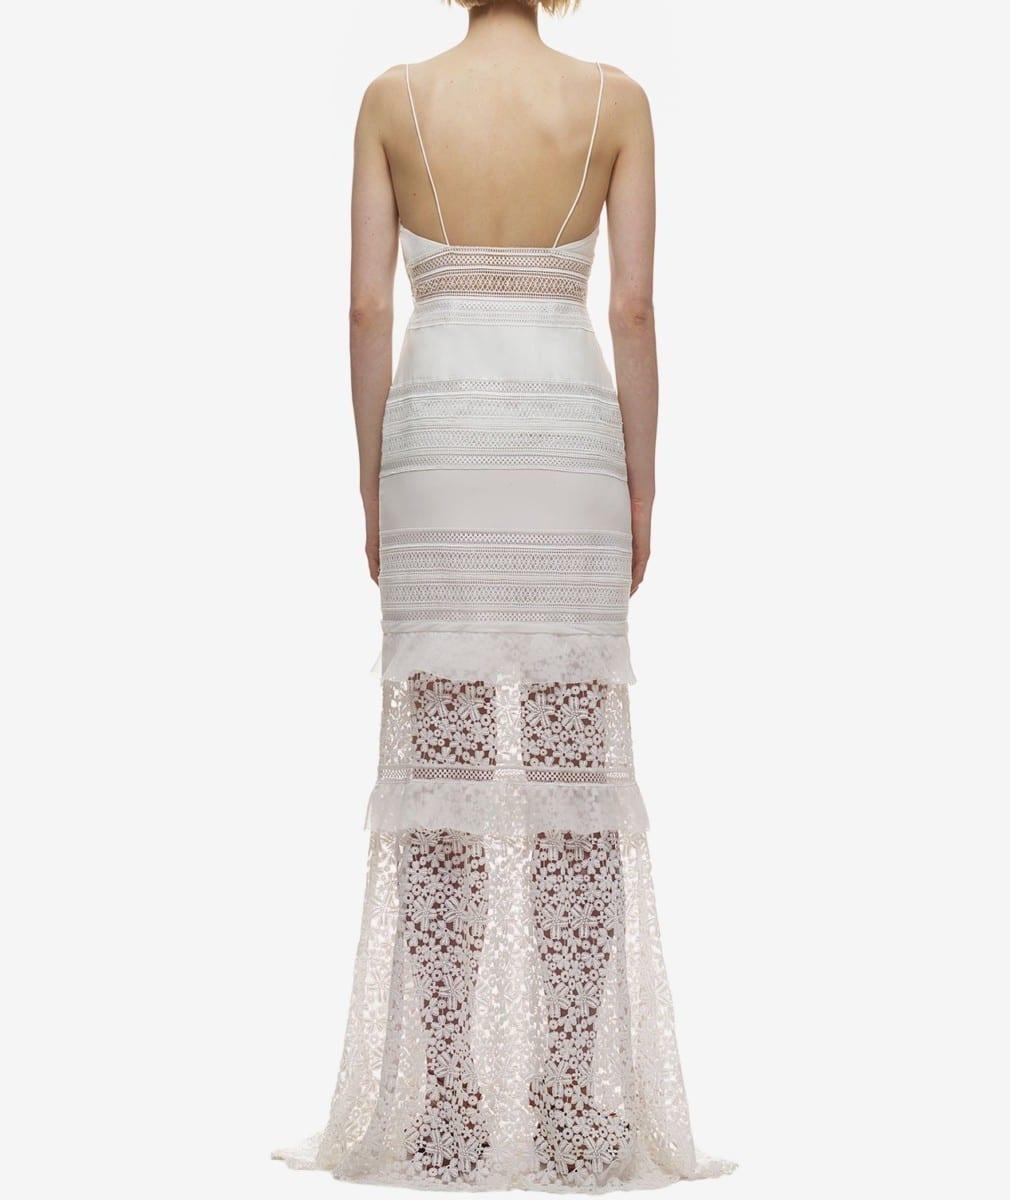 Robe De Mariée Self Portrait - Peony Bridal Dress